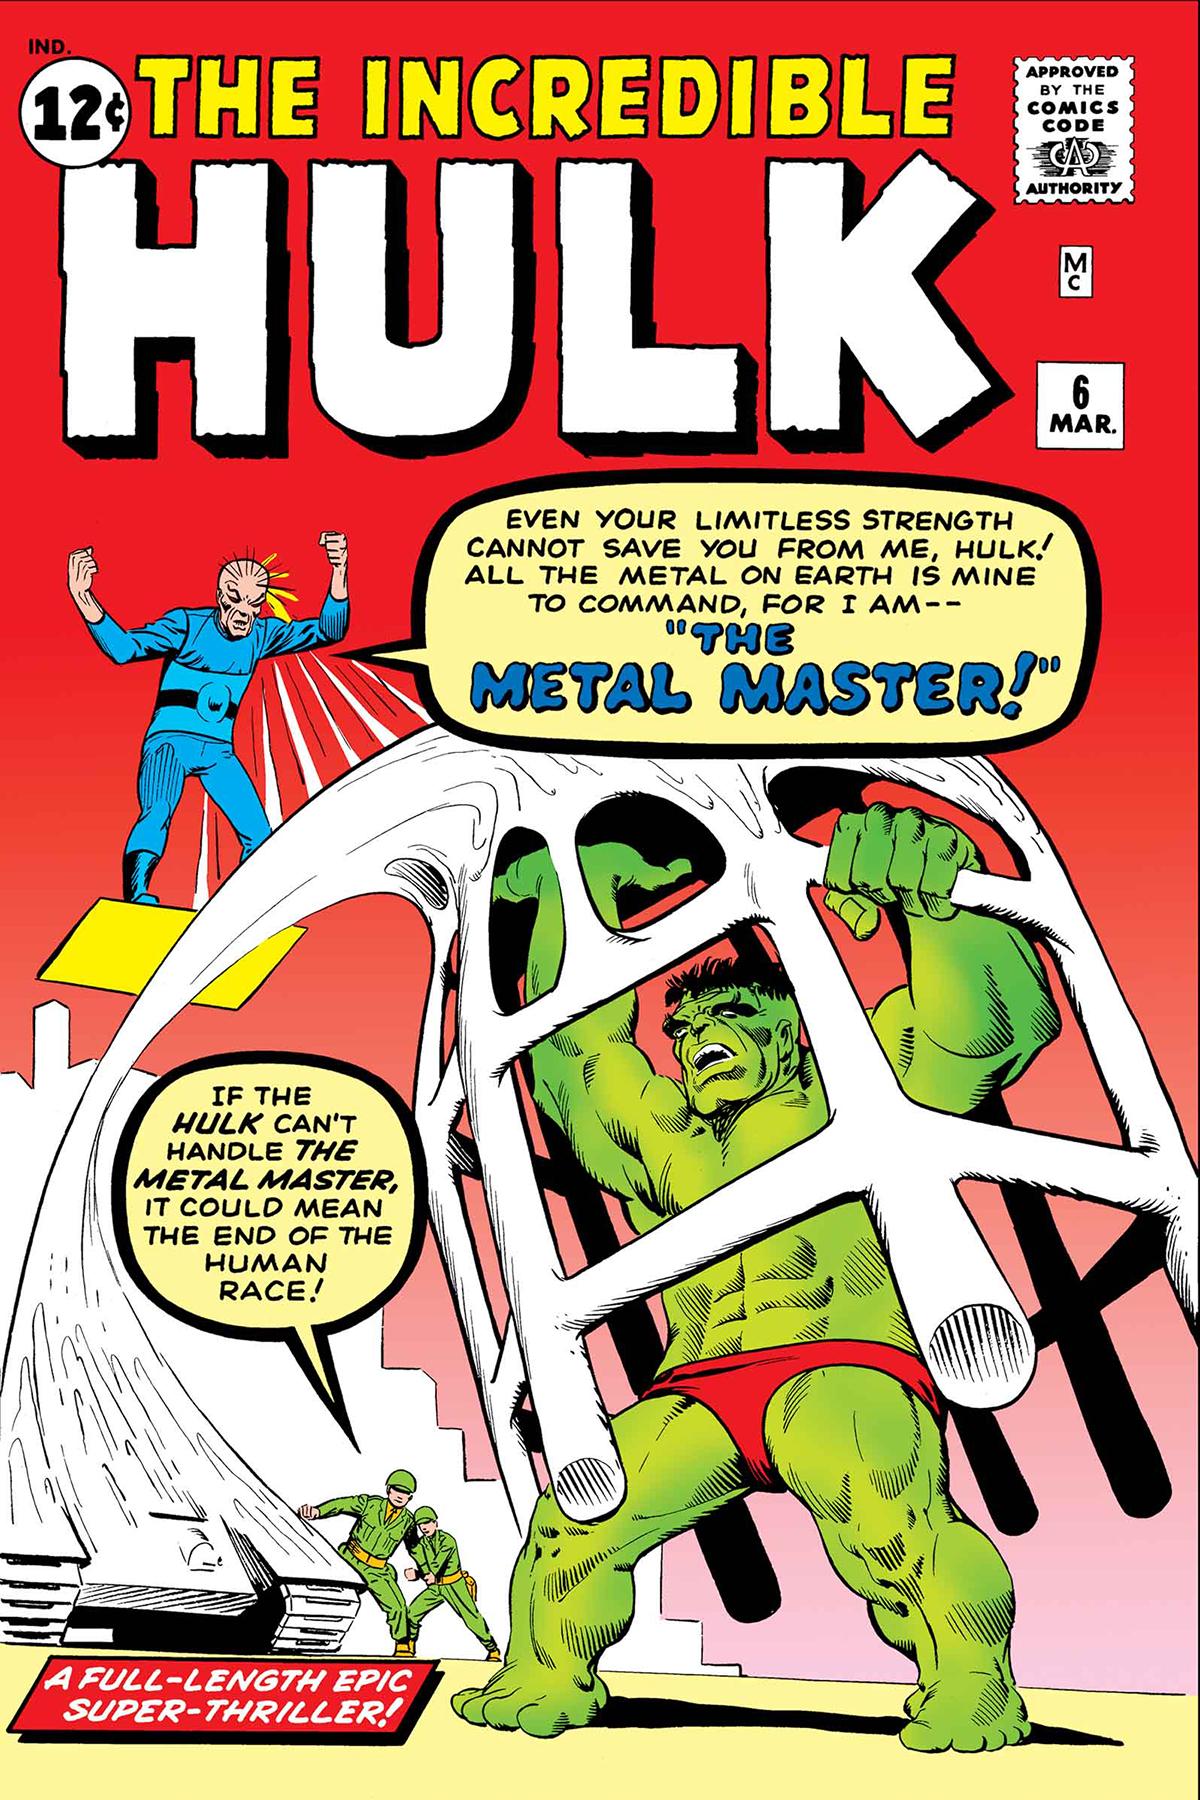 True Believers Hulk Head Of Banner #1 (STL130552) - Comics » Marvel